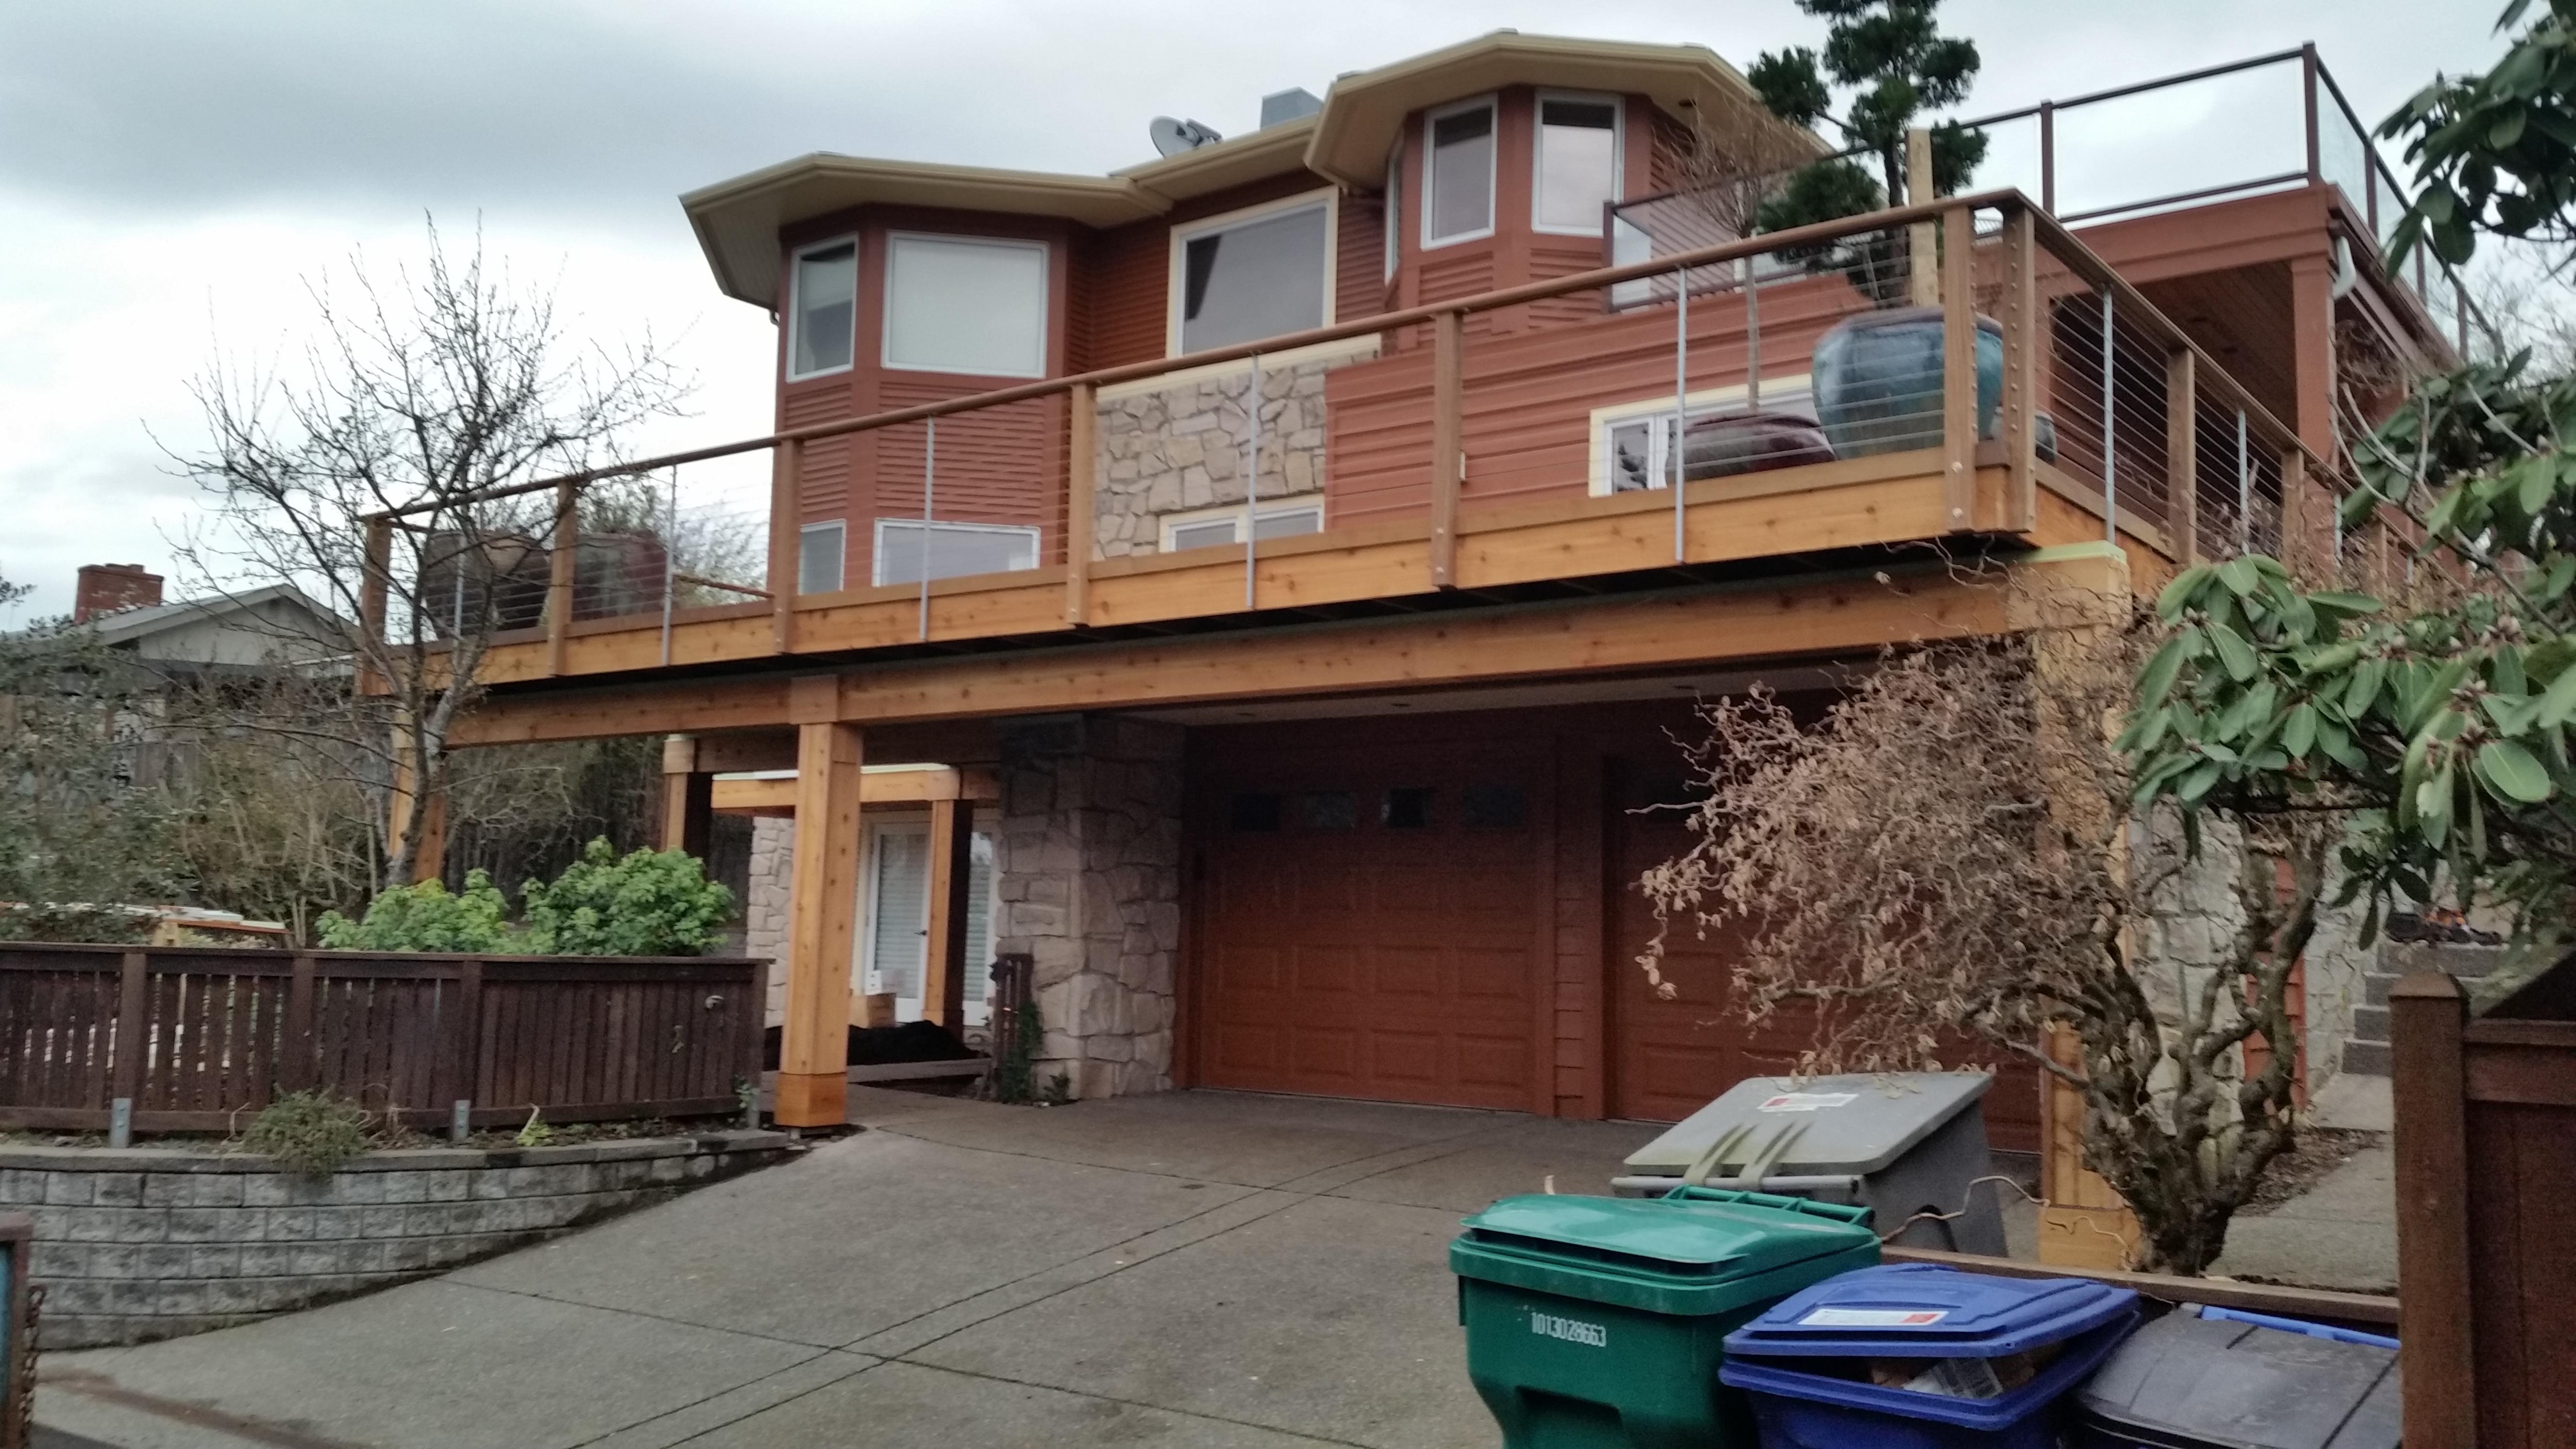 Plantrak Home Improvement Co - ad image